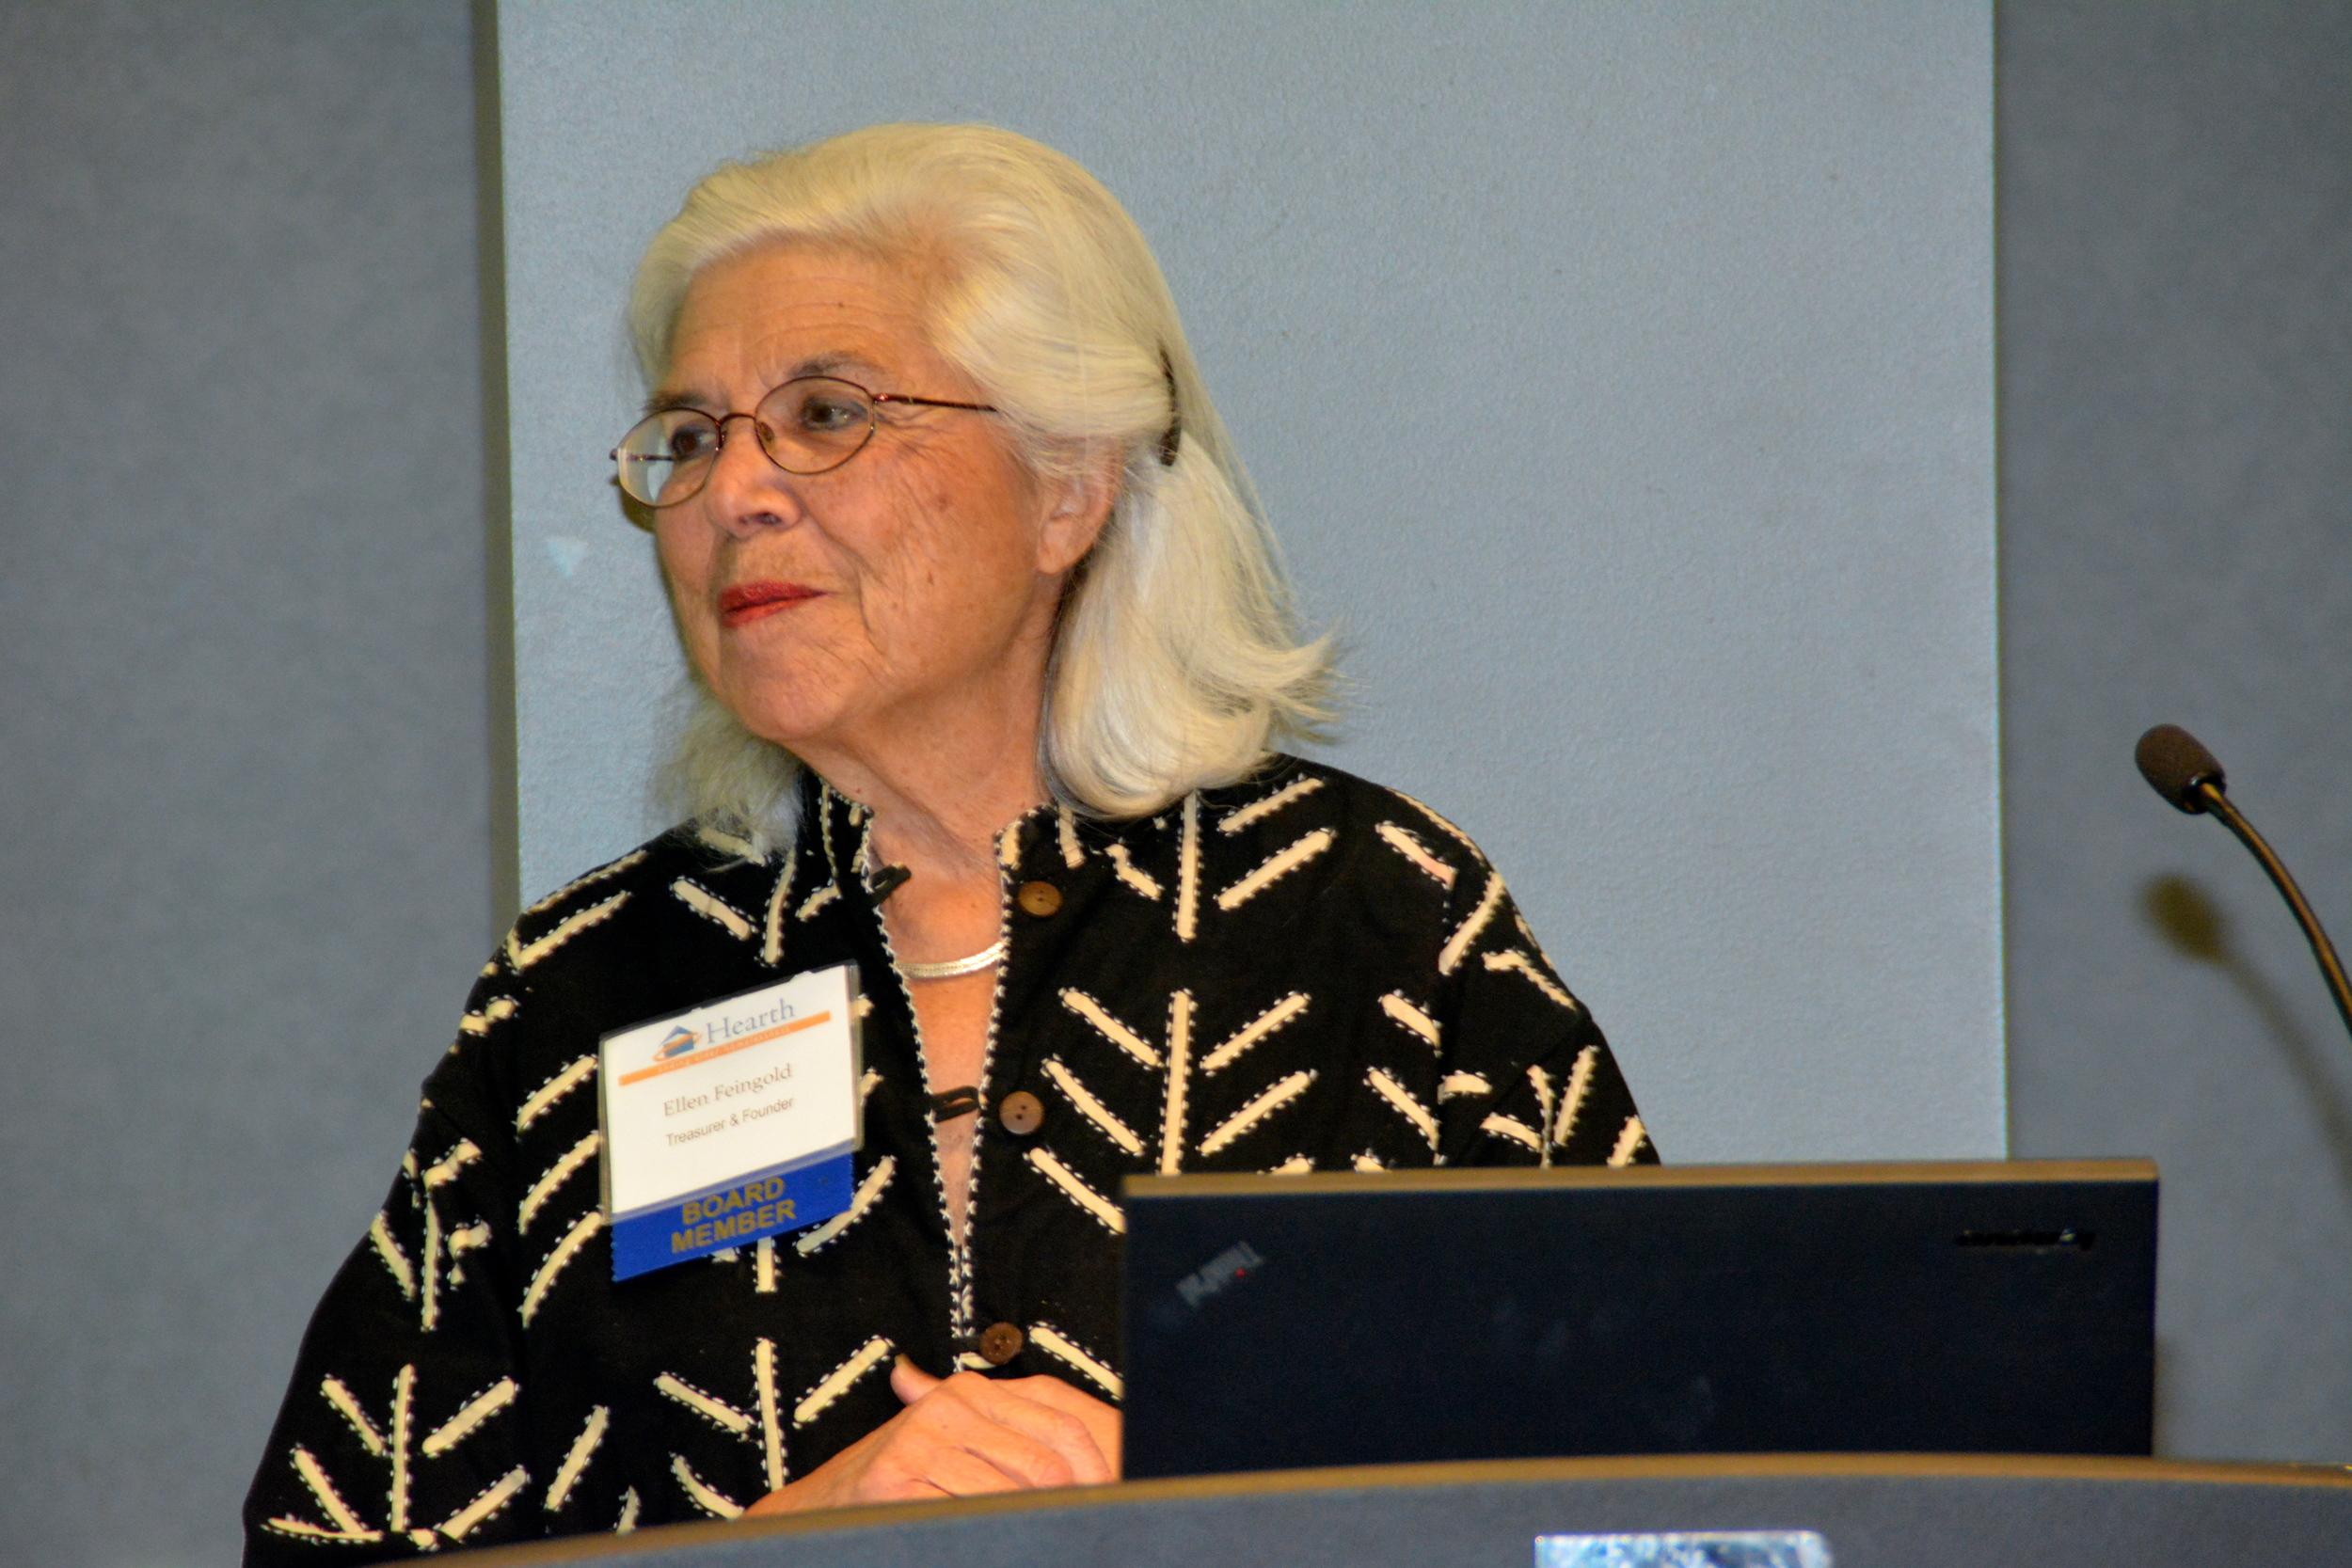 Hearth Treasurer and Founder Ellen Feingold gives the Treasurer's Report.